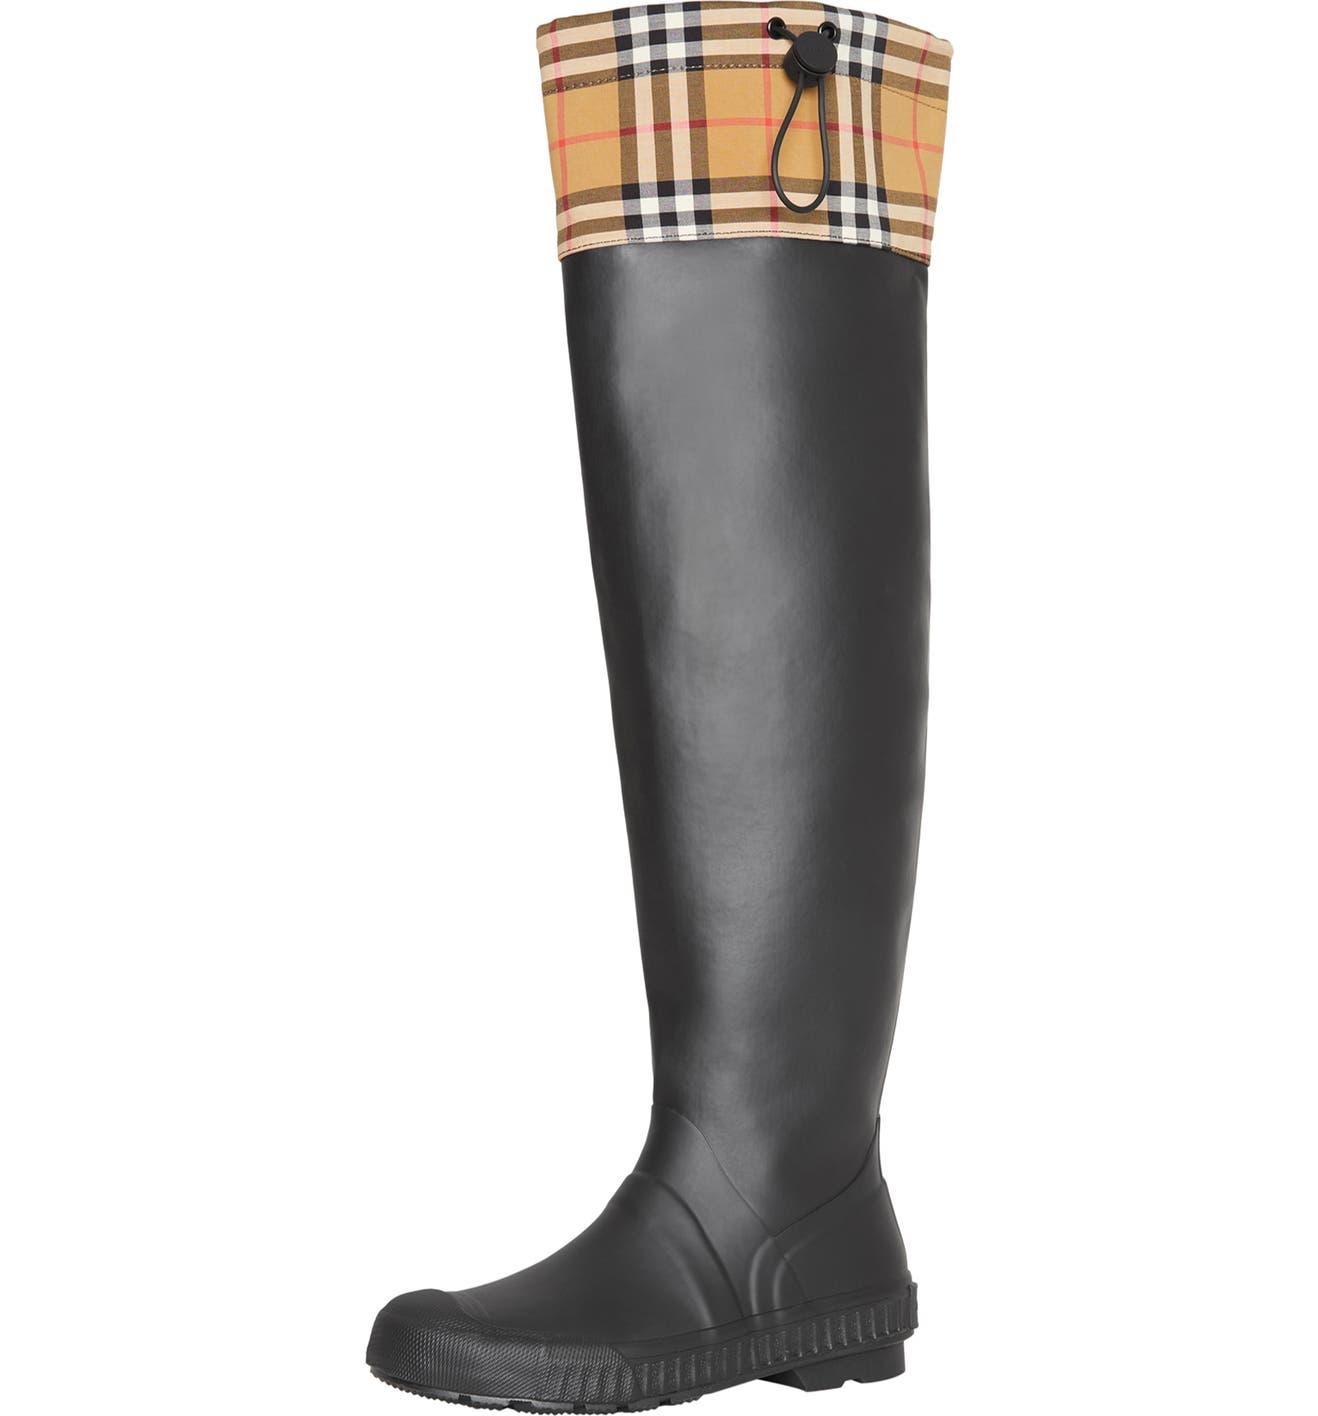 edc213367d Burberry Freddie Tall Waterproof Rain Boot (Women) | Nordstrom